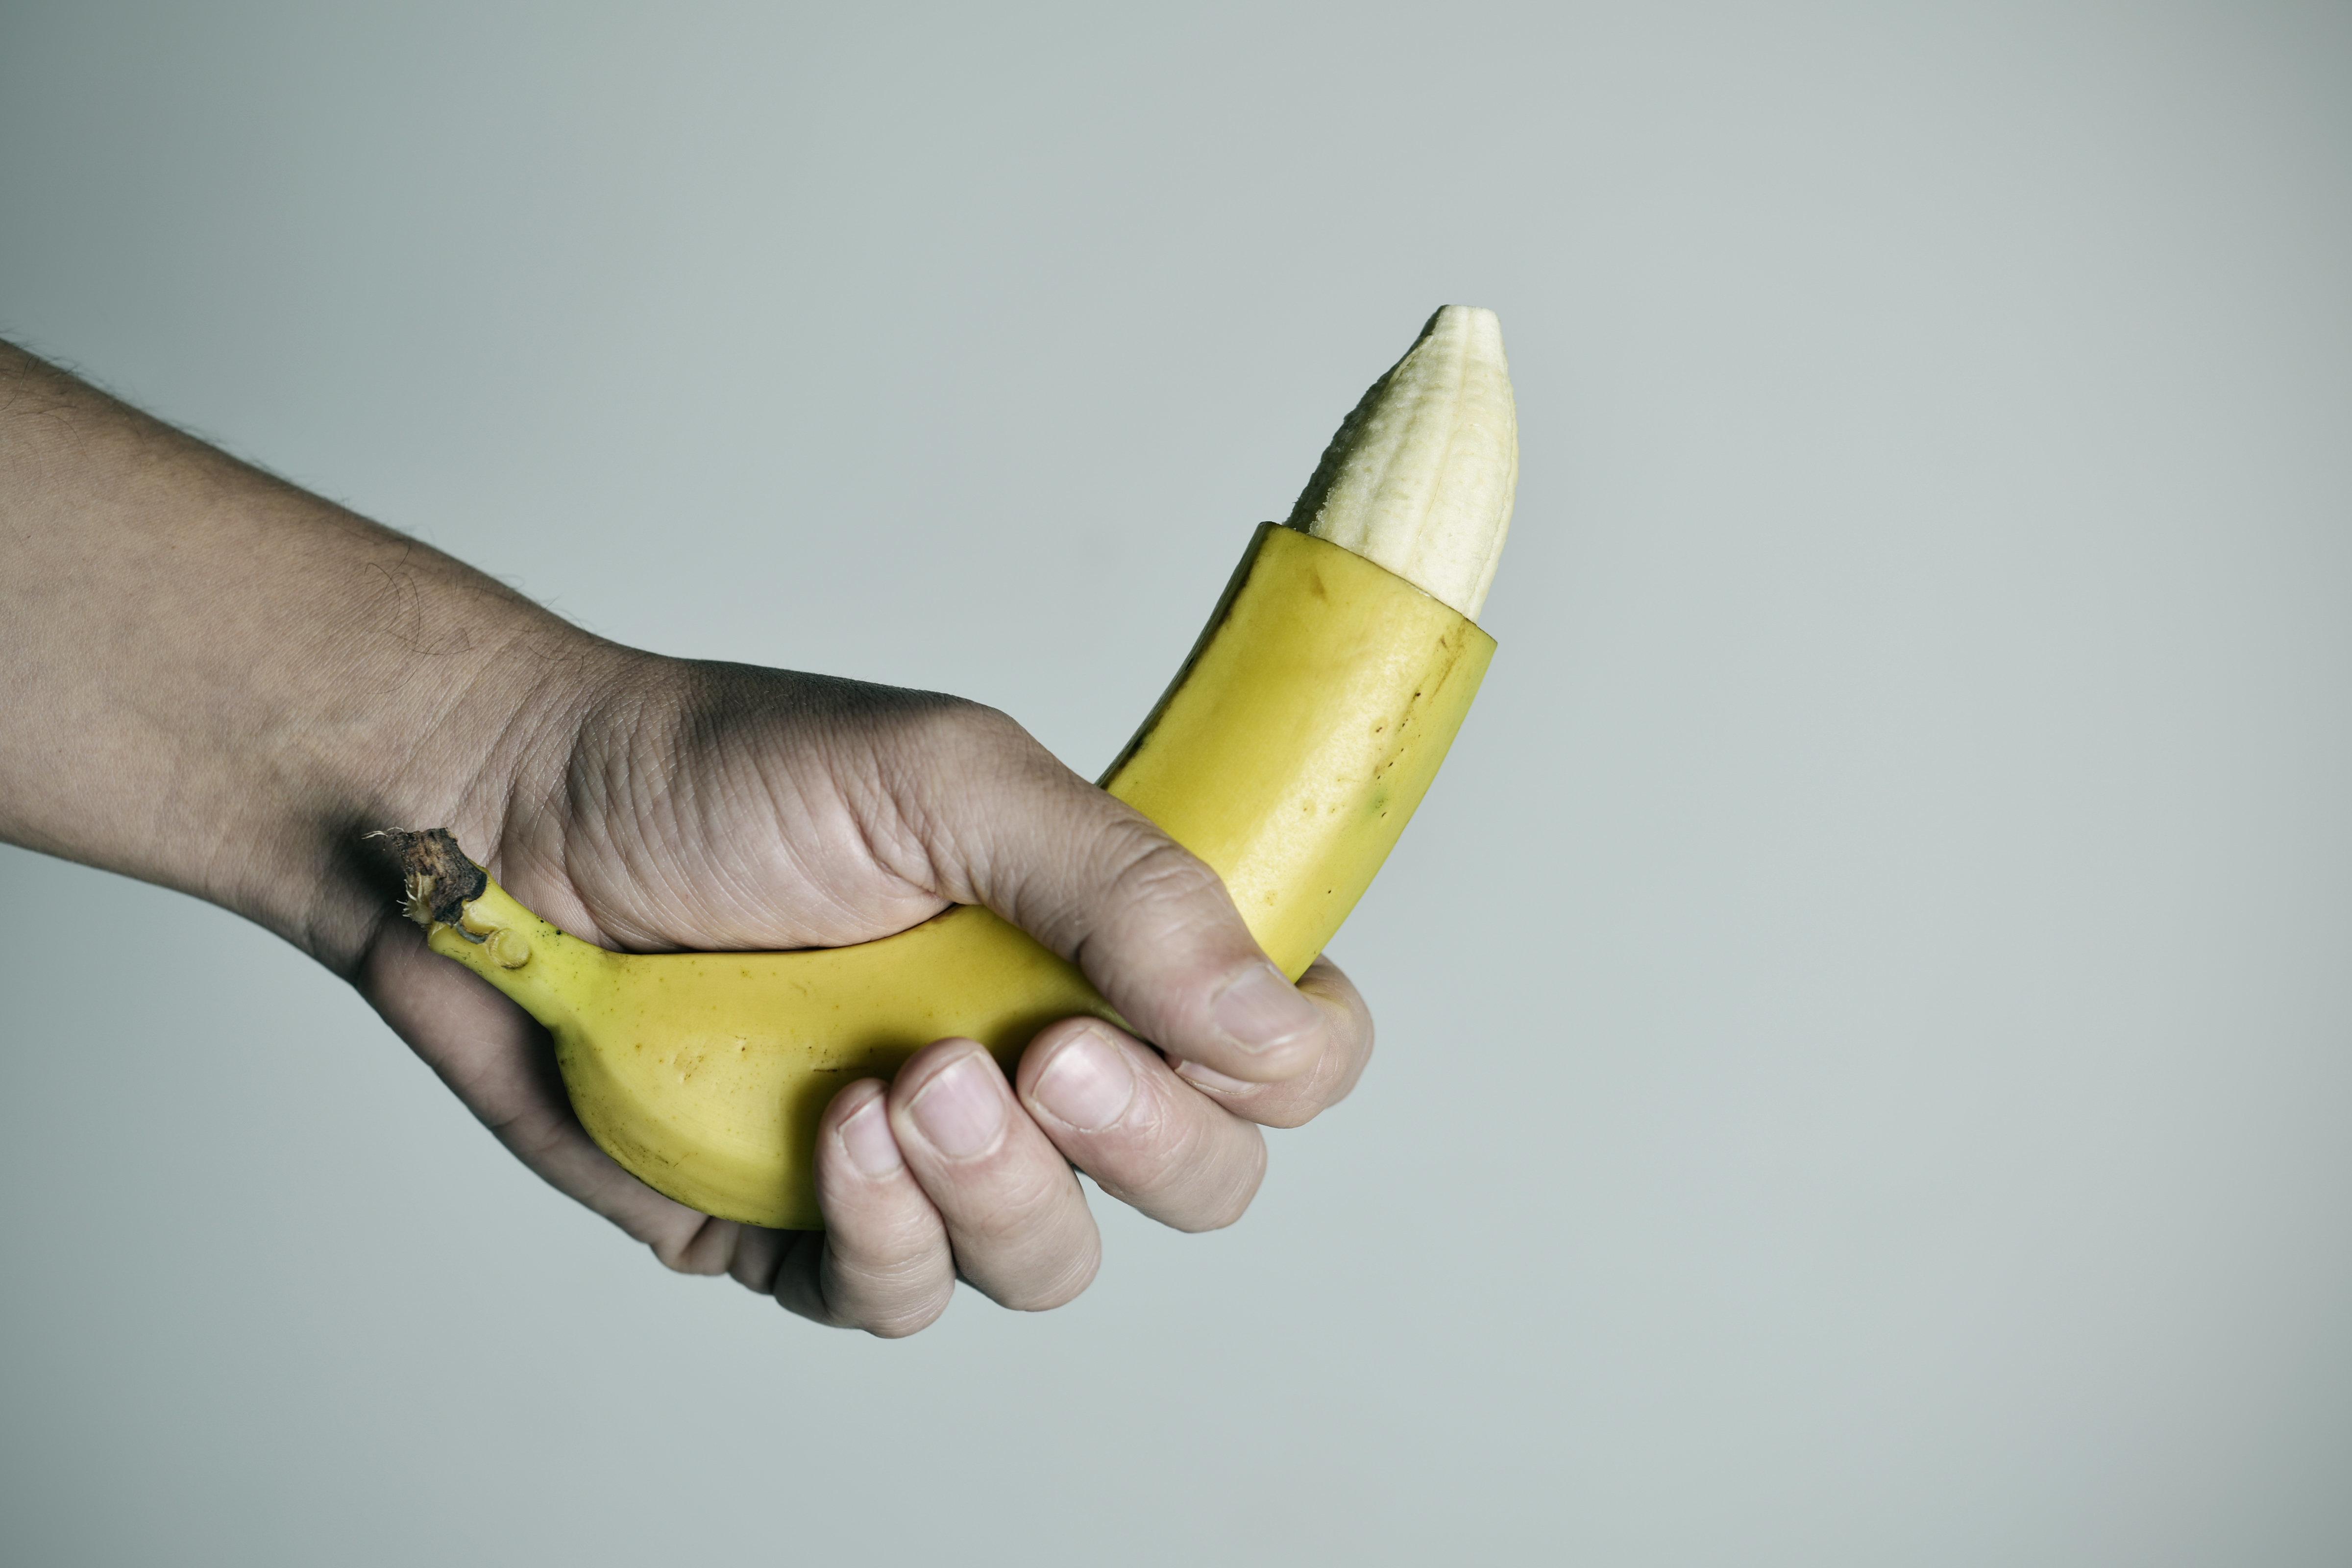 GroГџer Penis-Mythos Solo-Homosexueller Sex